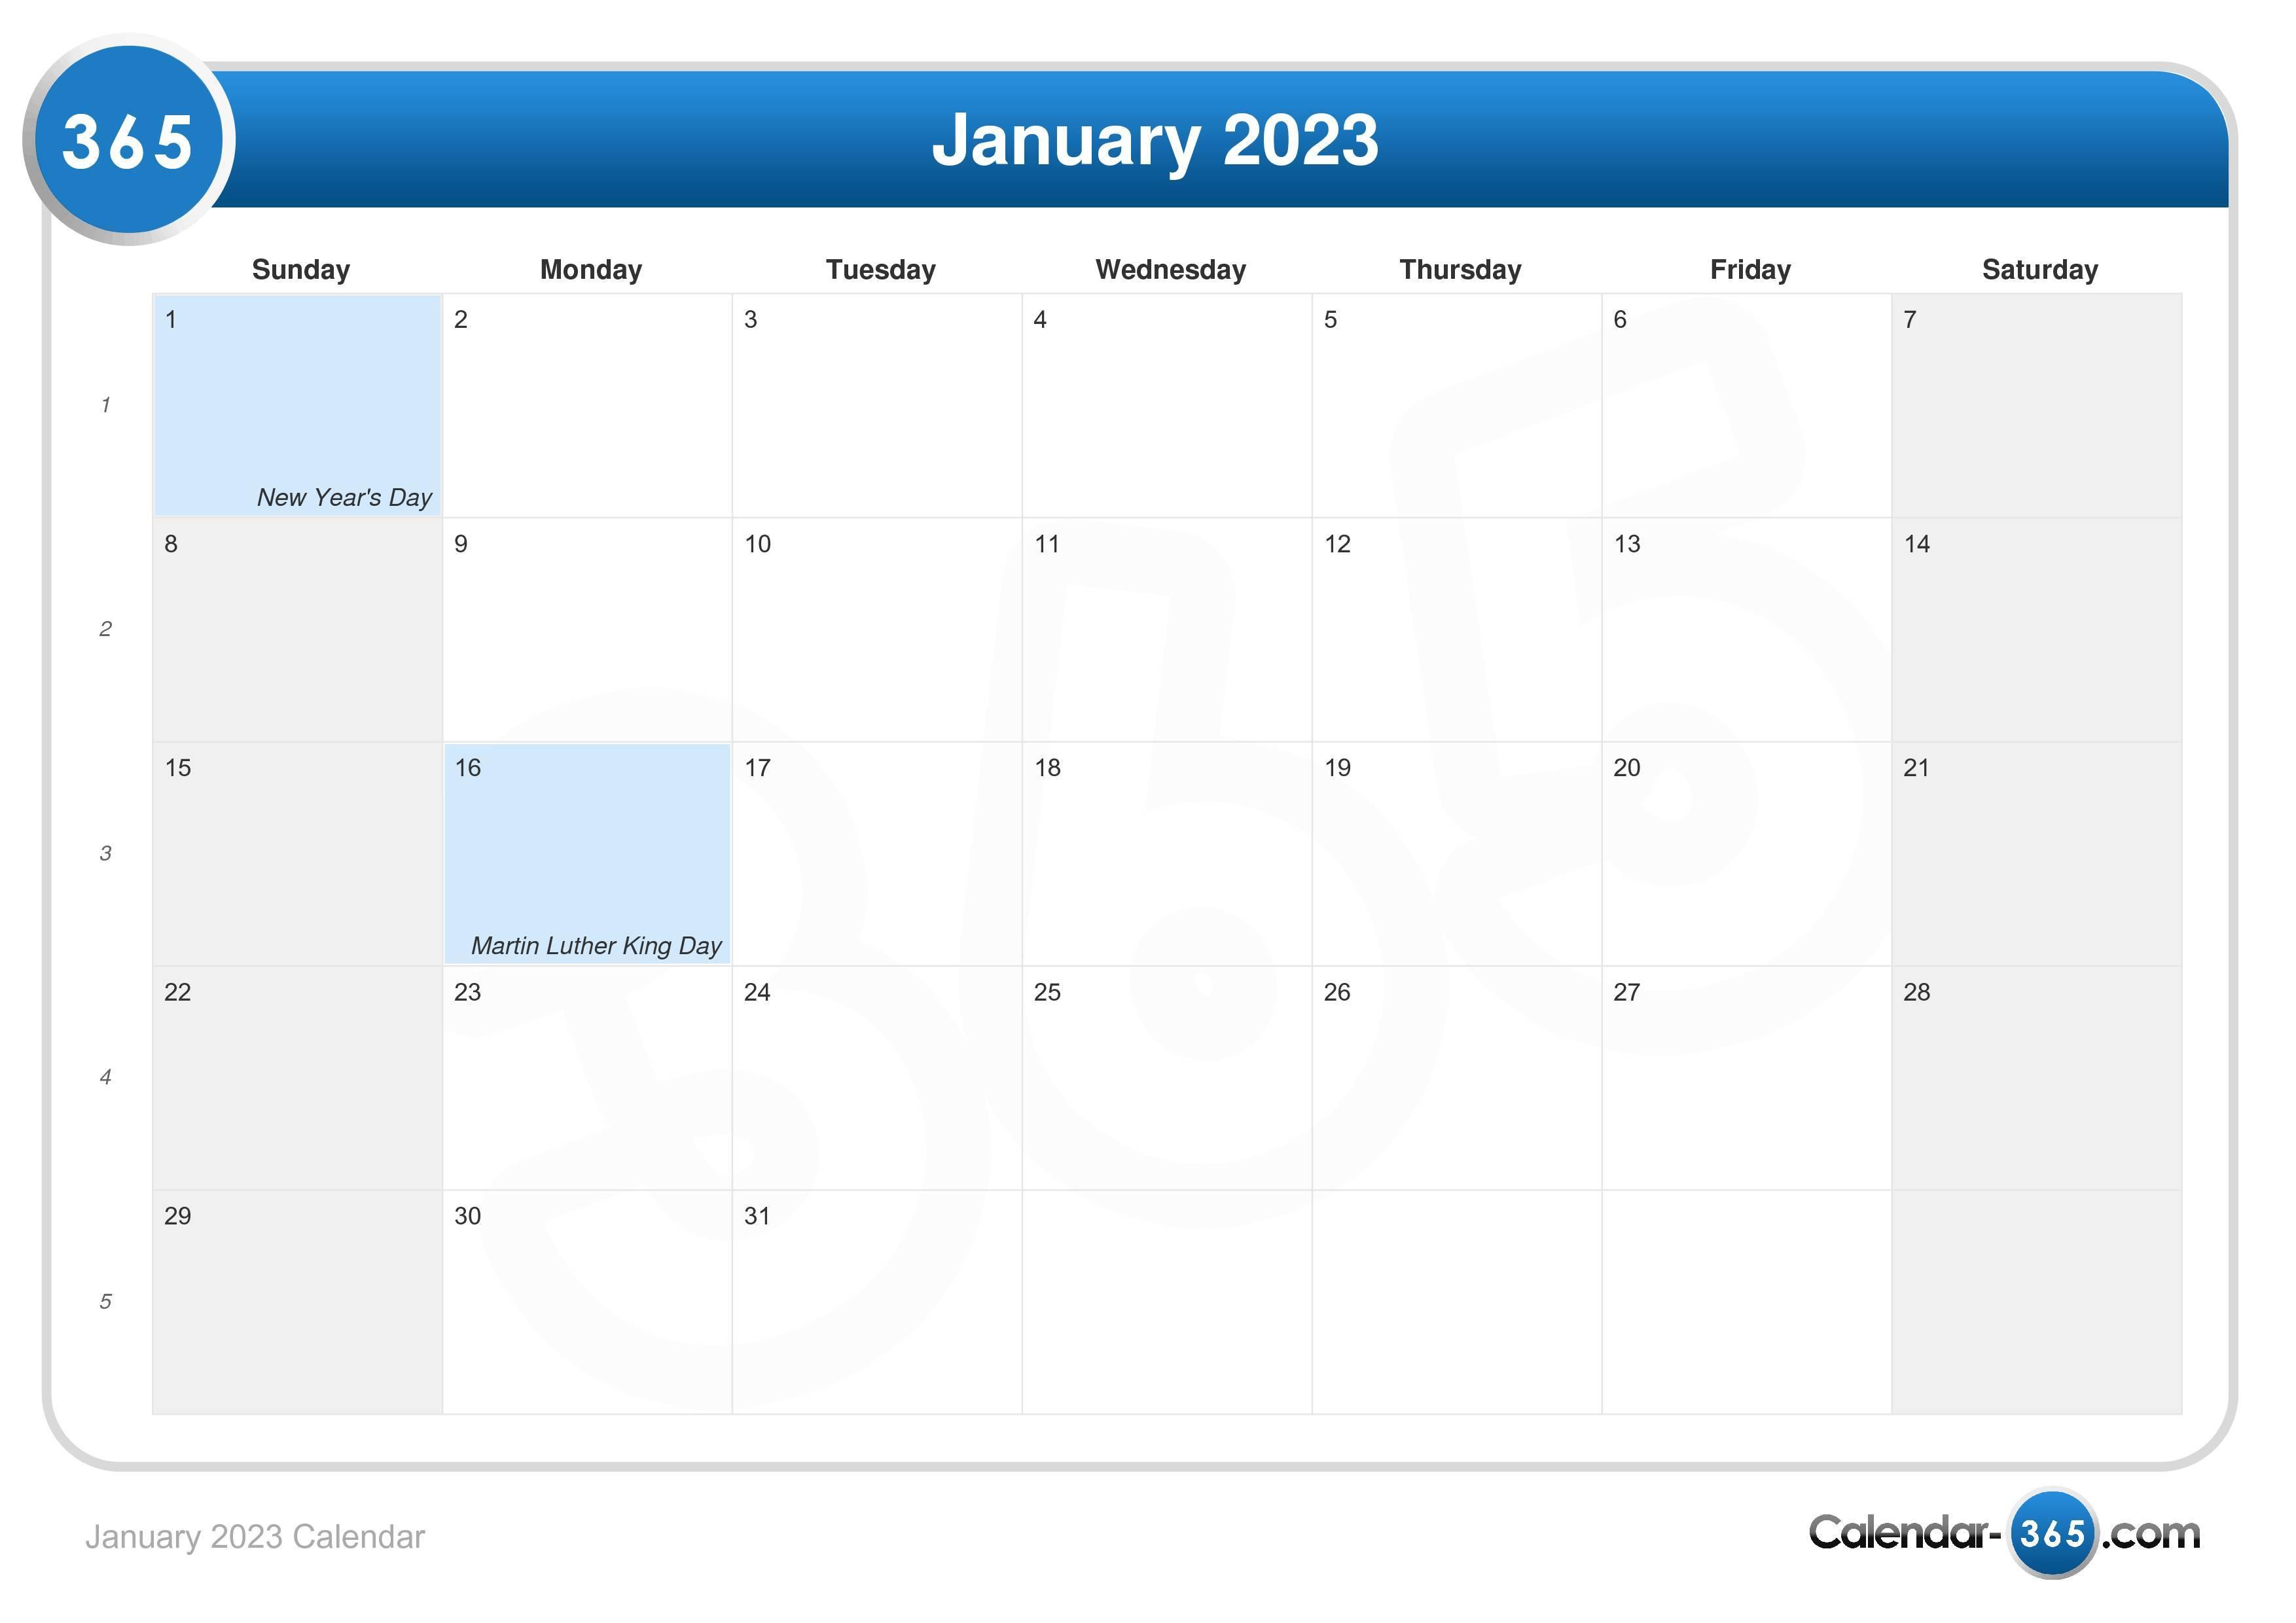 Calendar December 2023 January 2022.January 2023 Calendar